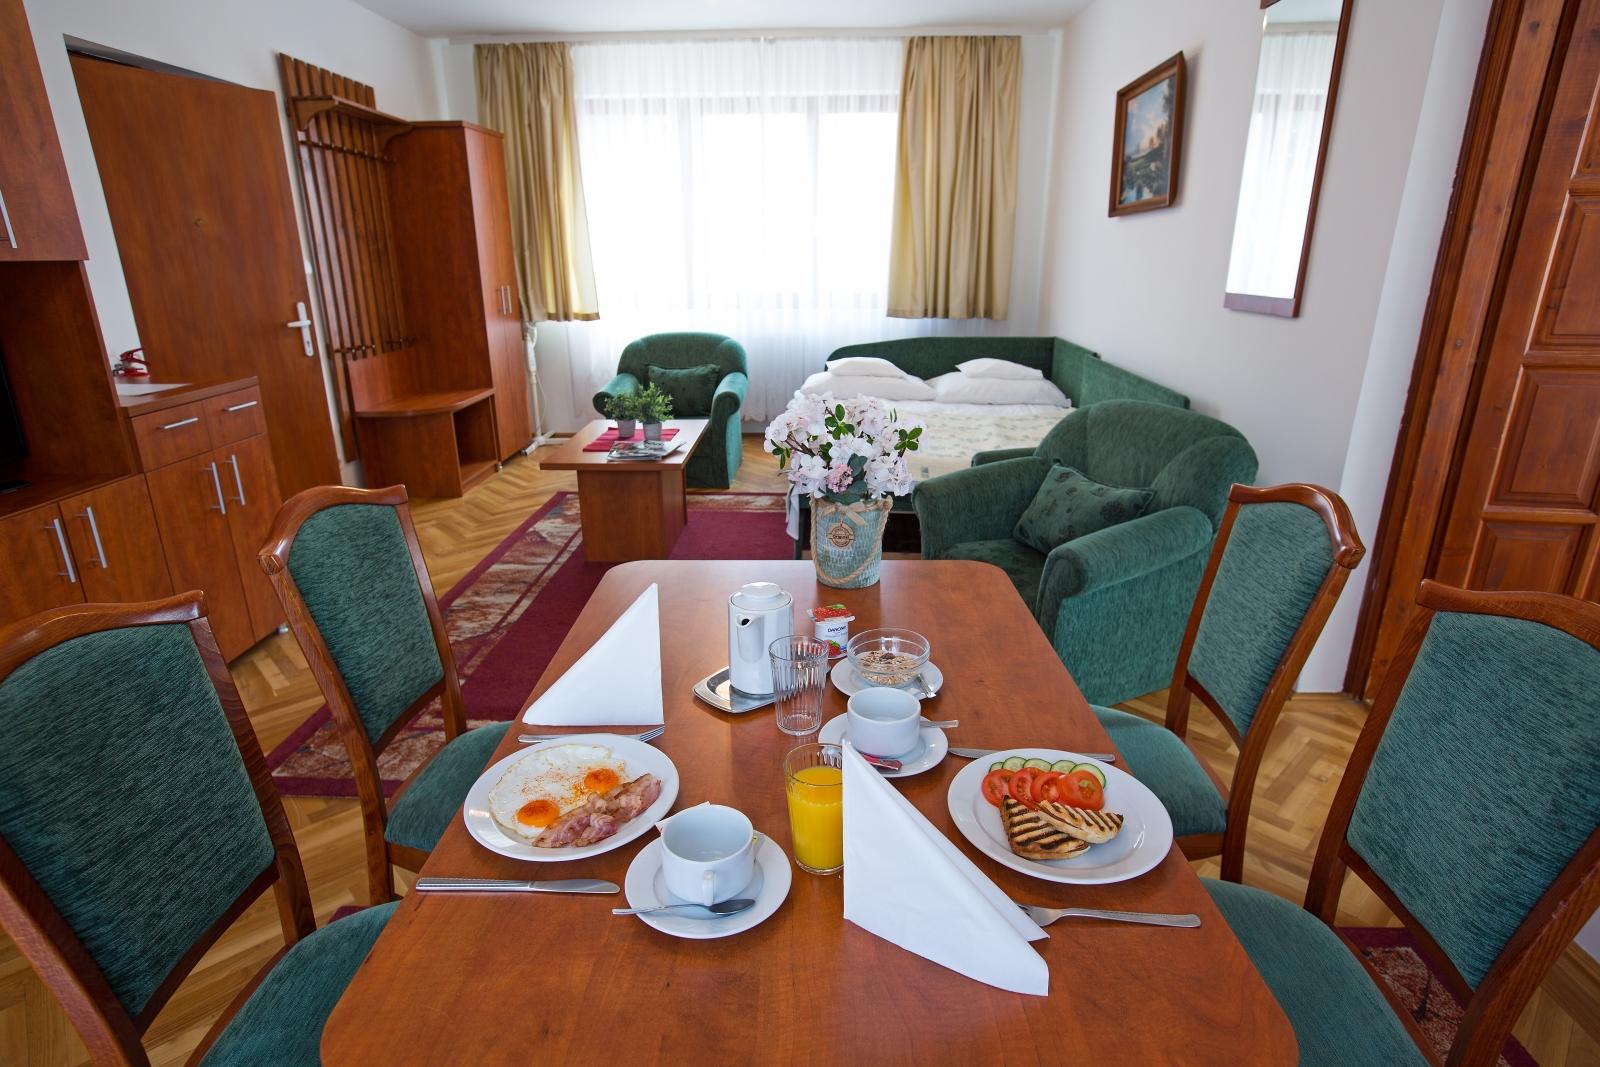 Apartment buffet breakfast